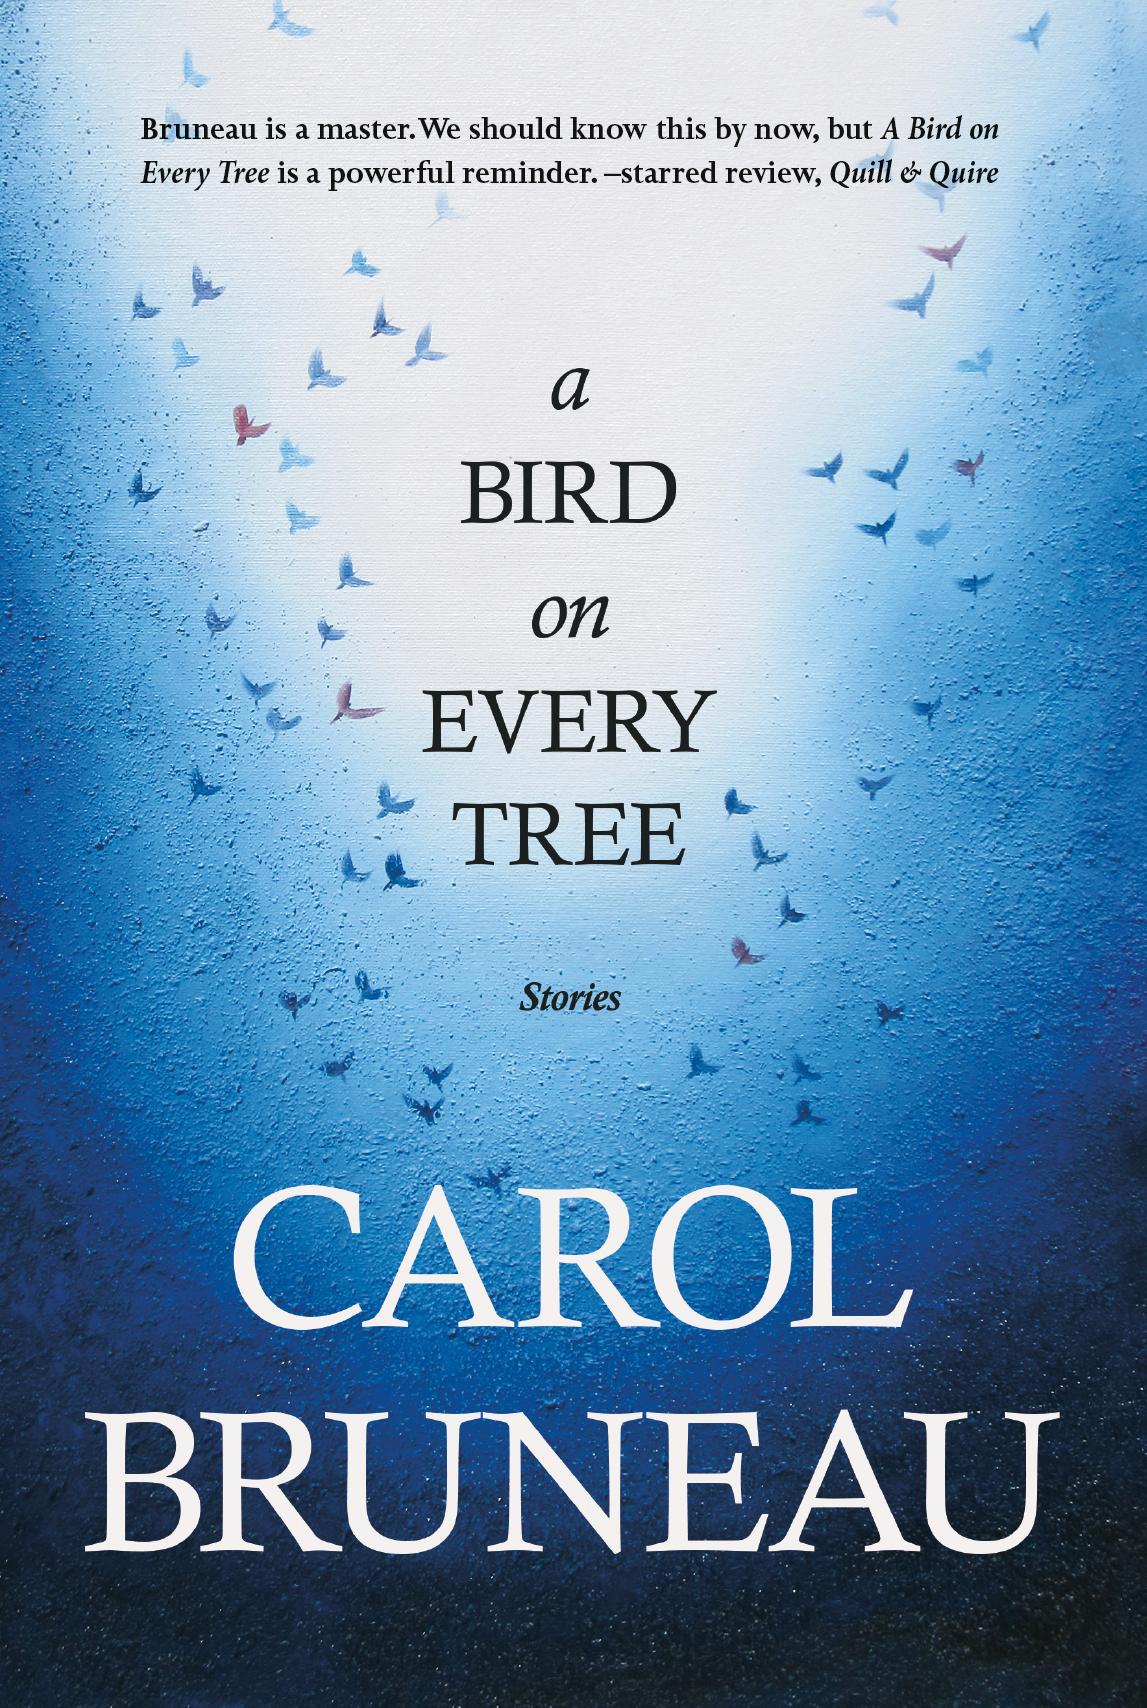 A Bird on Every Tree